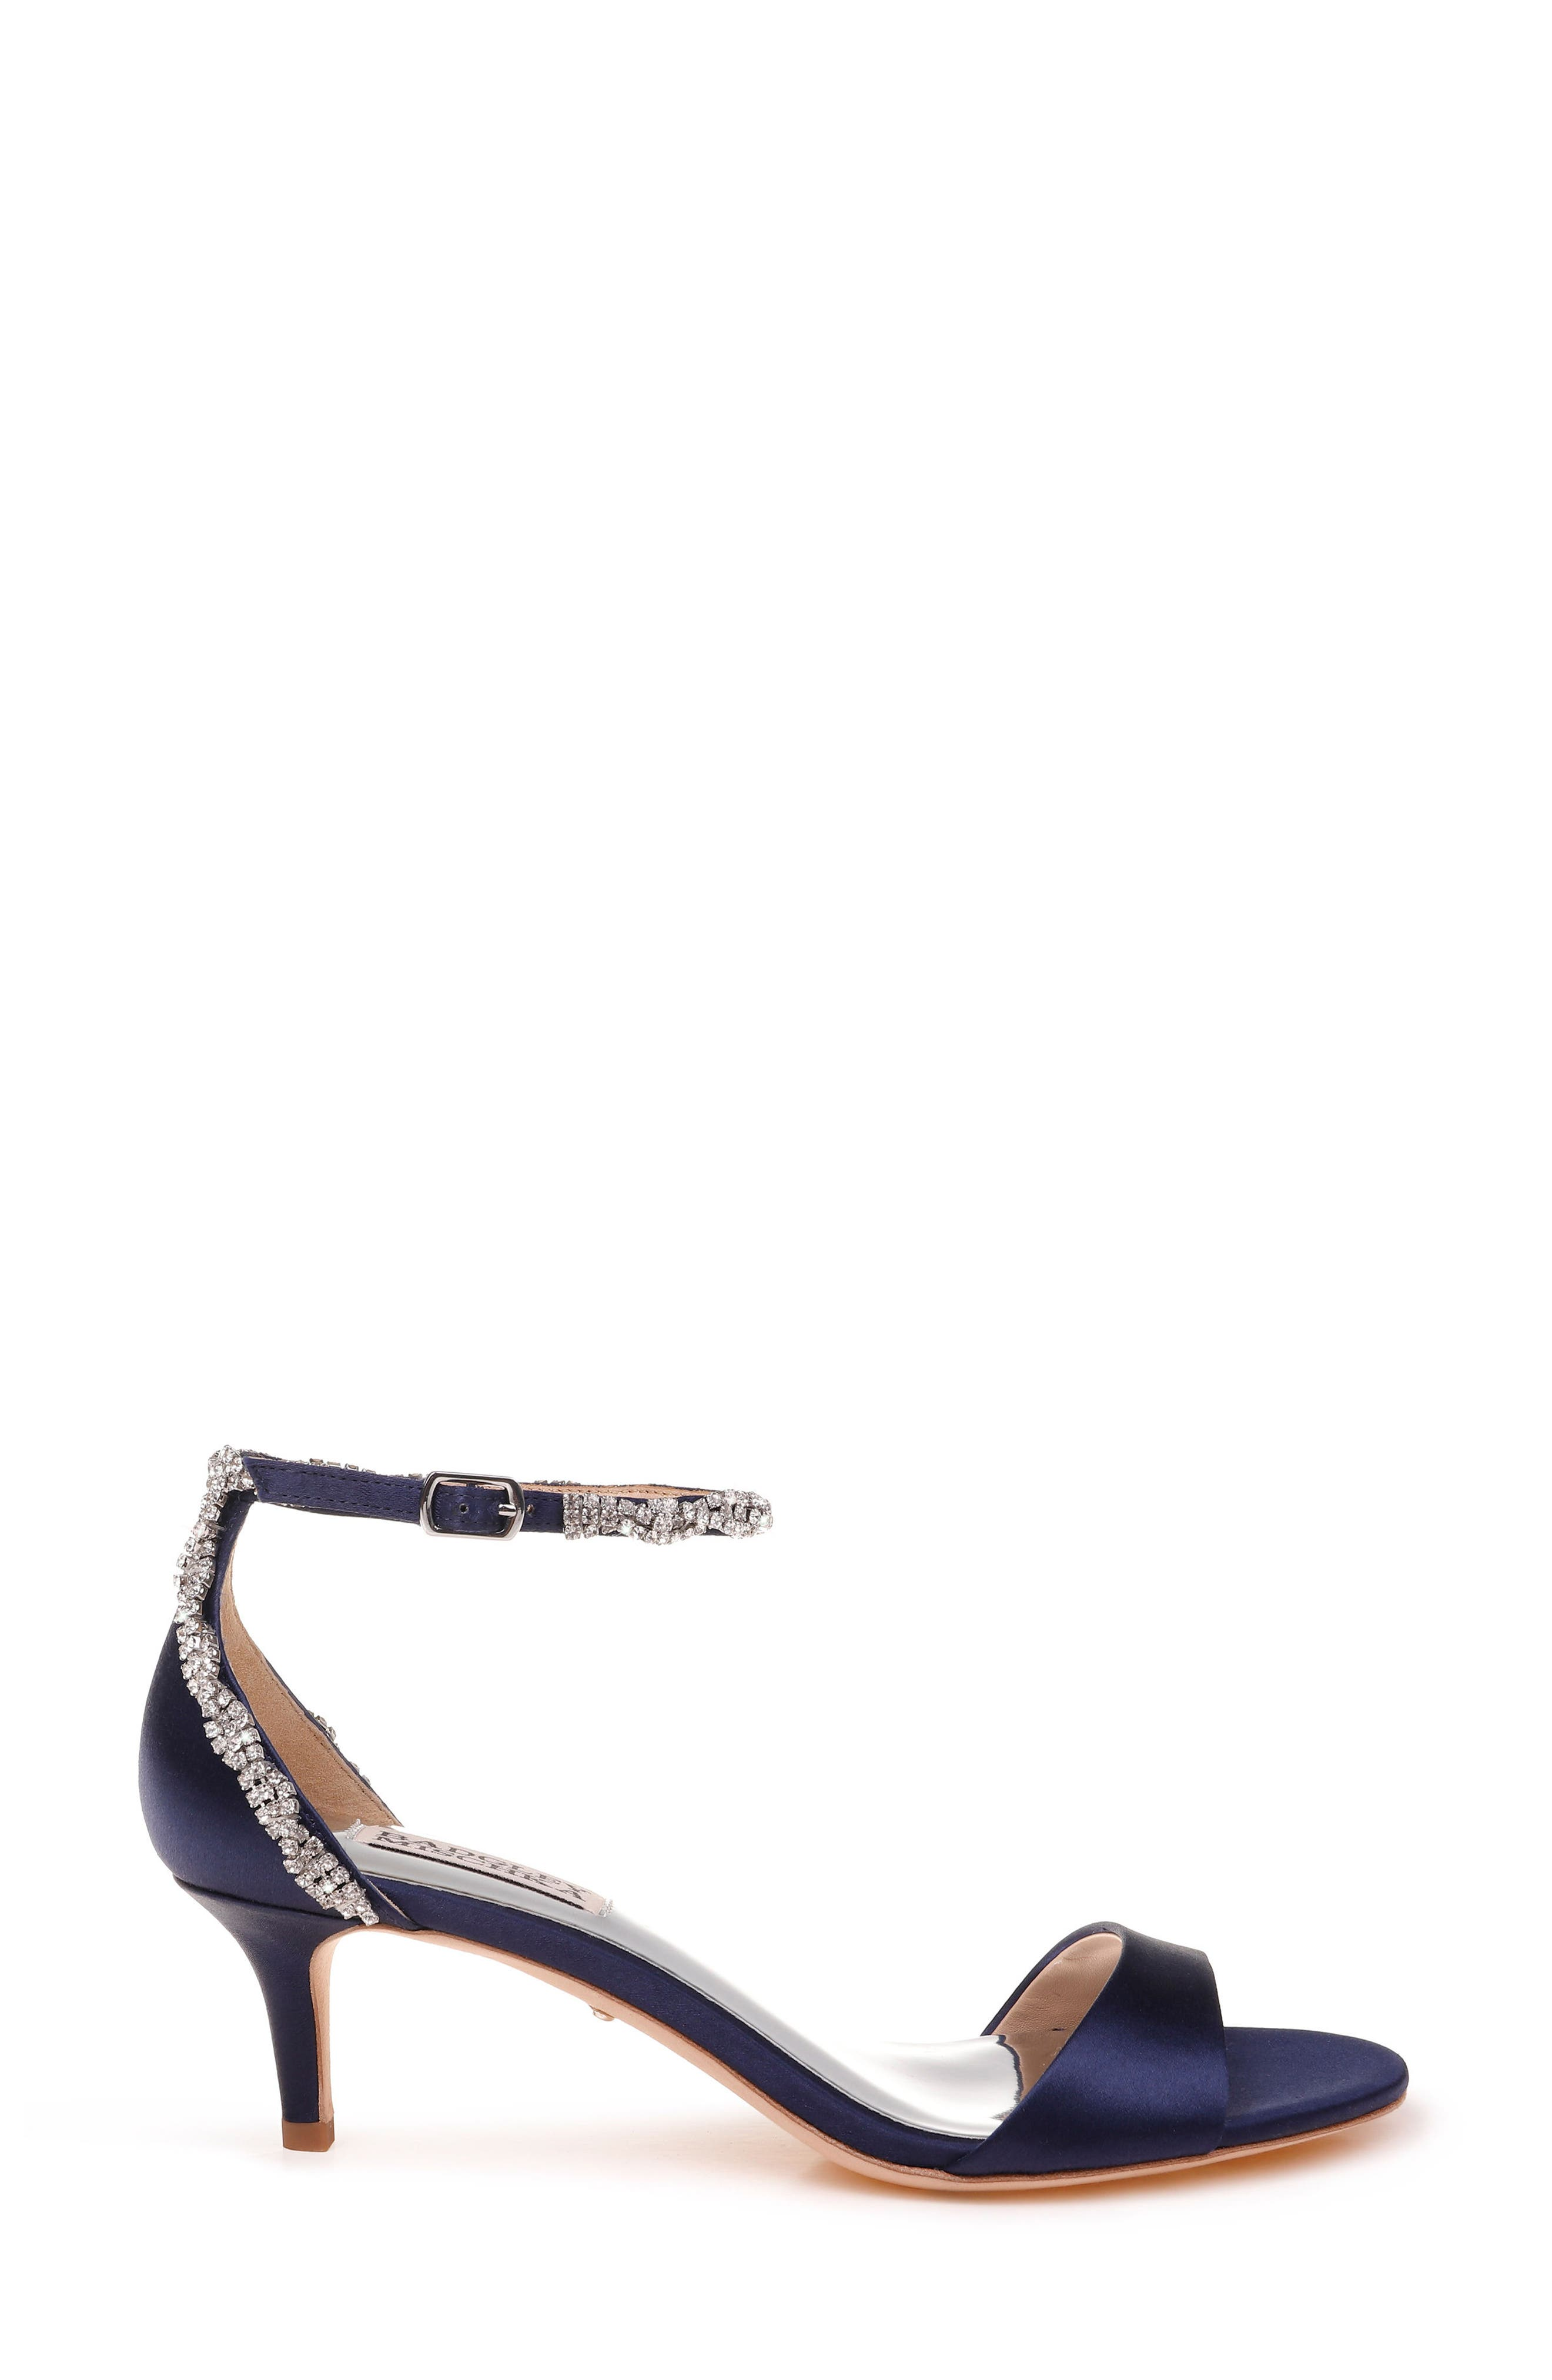 Yareli Crystal Embellished Sandal,                             Alternate thumbnail 3, color,                             Midnight Satin